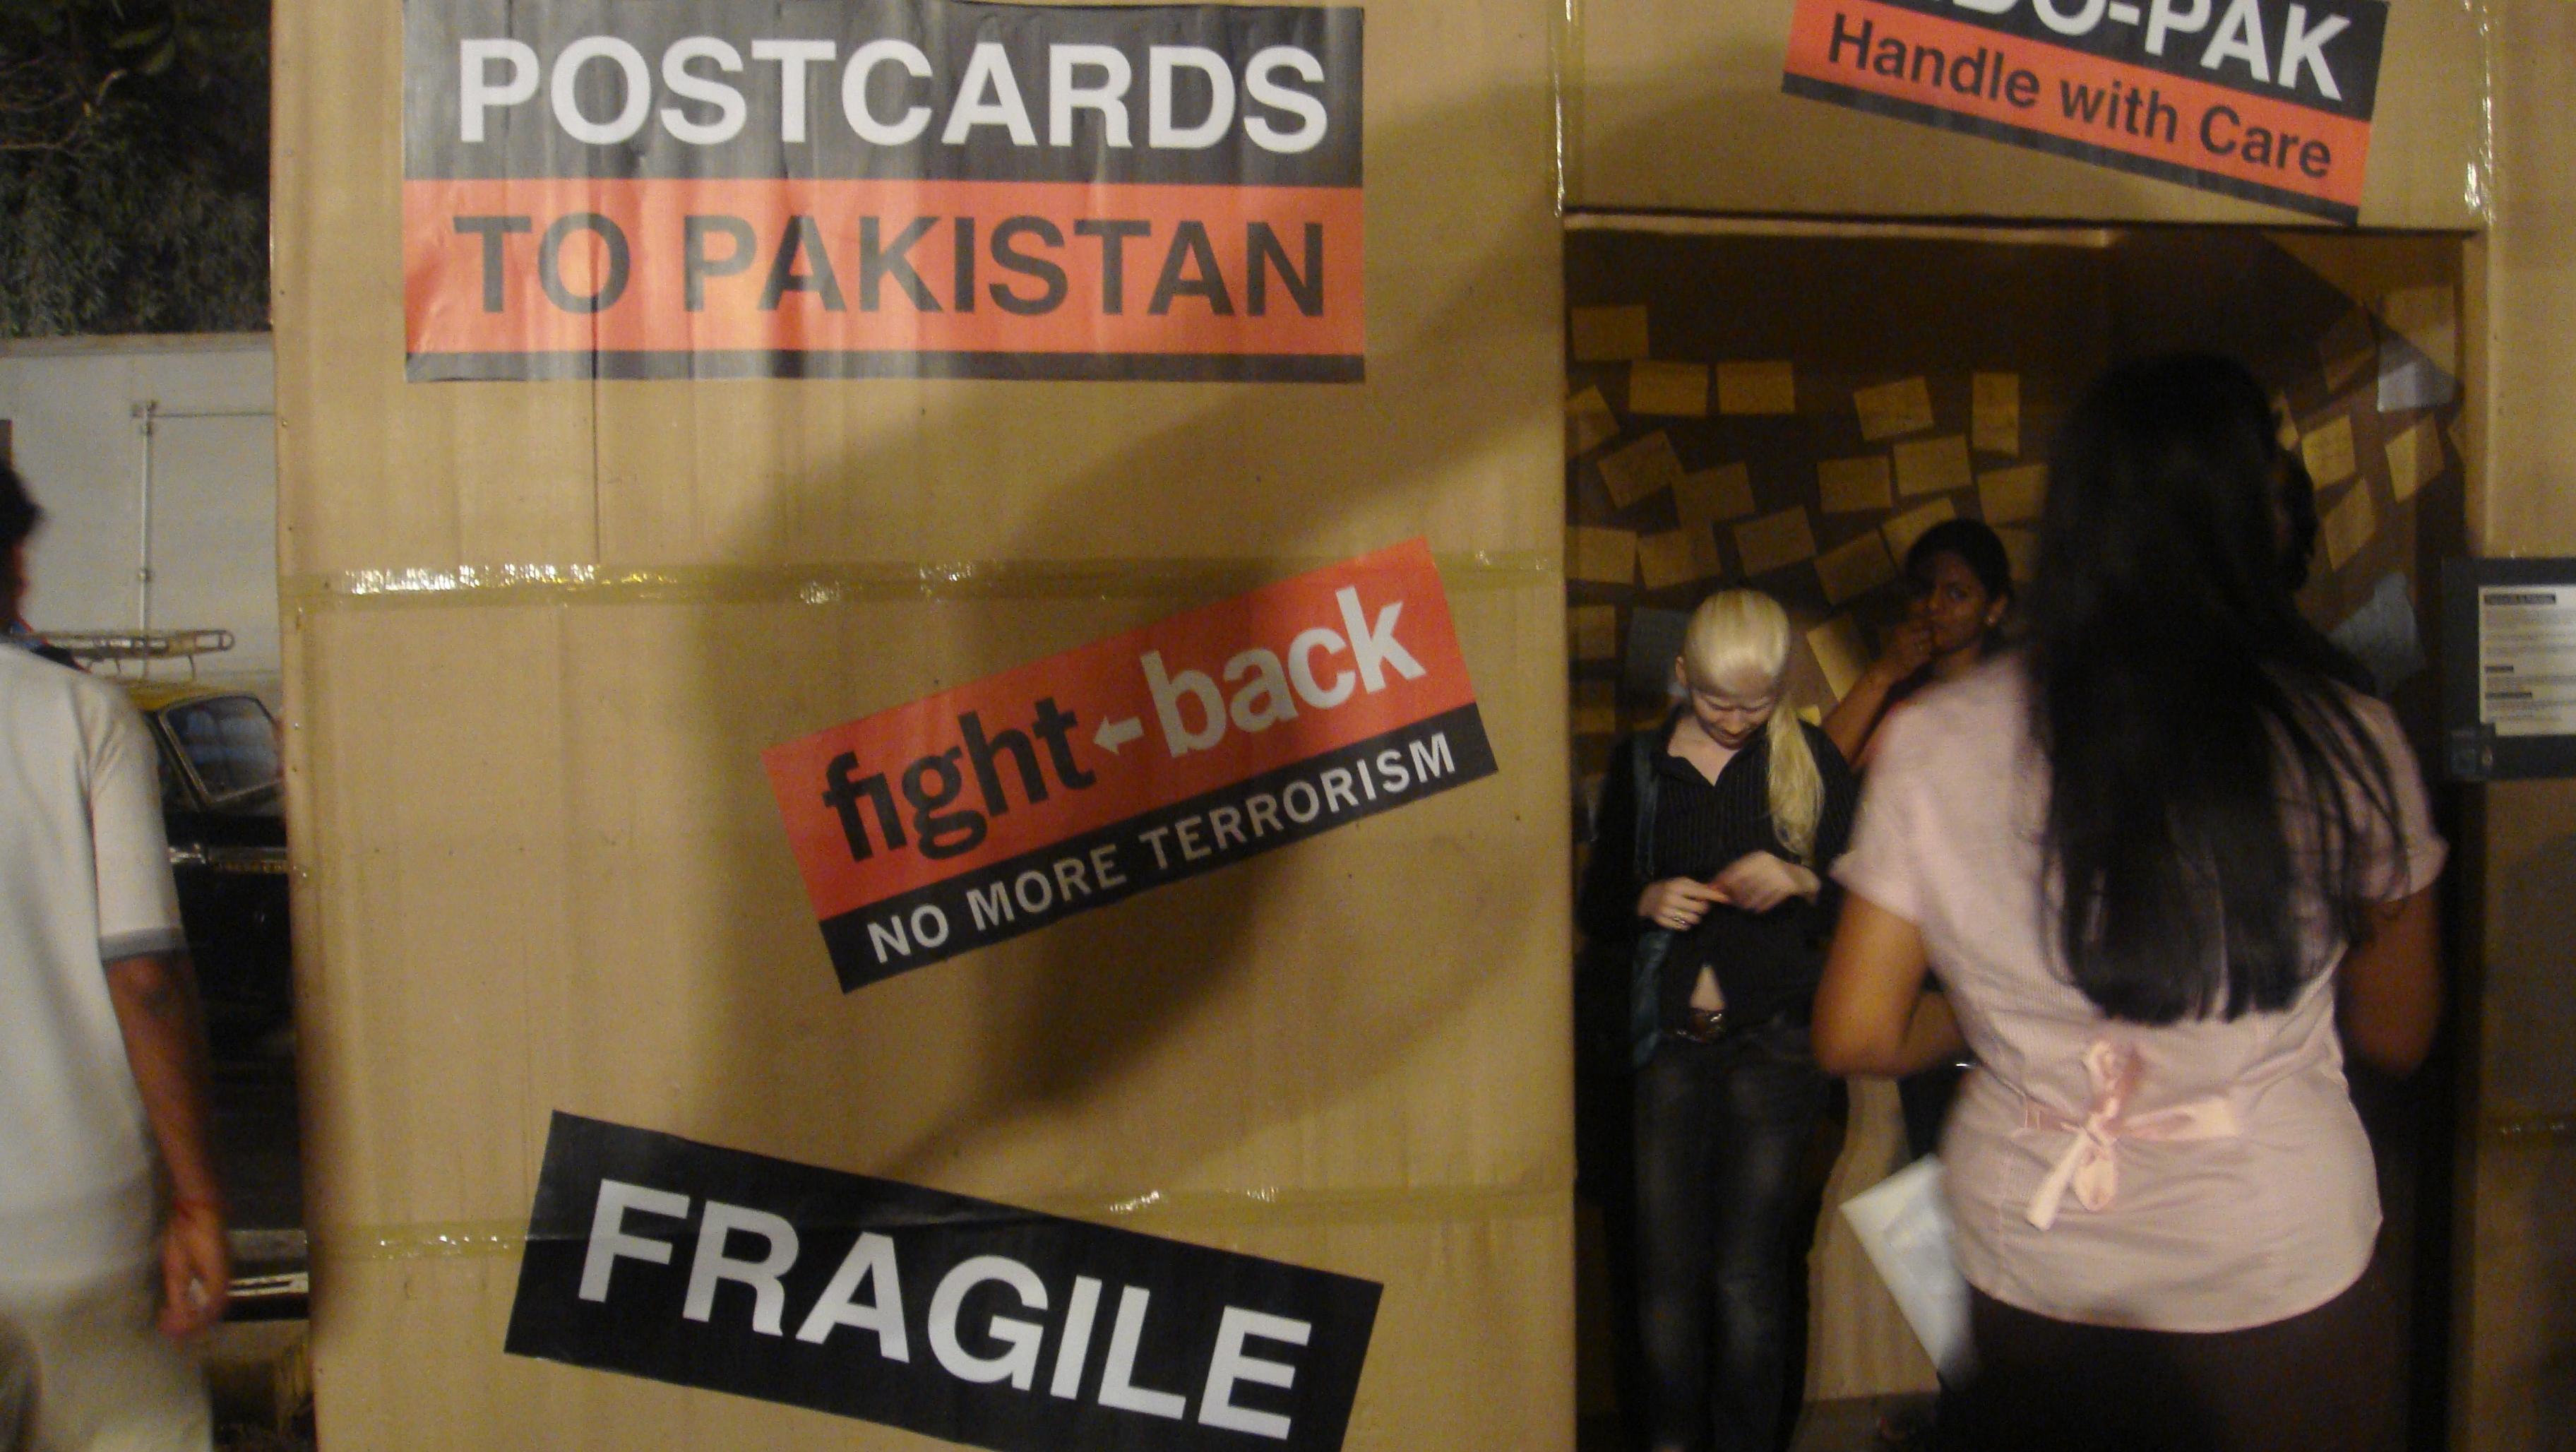 Postcards to Pakistan